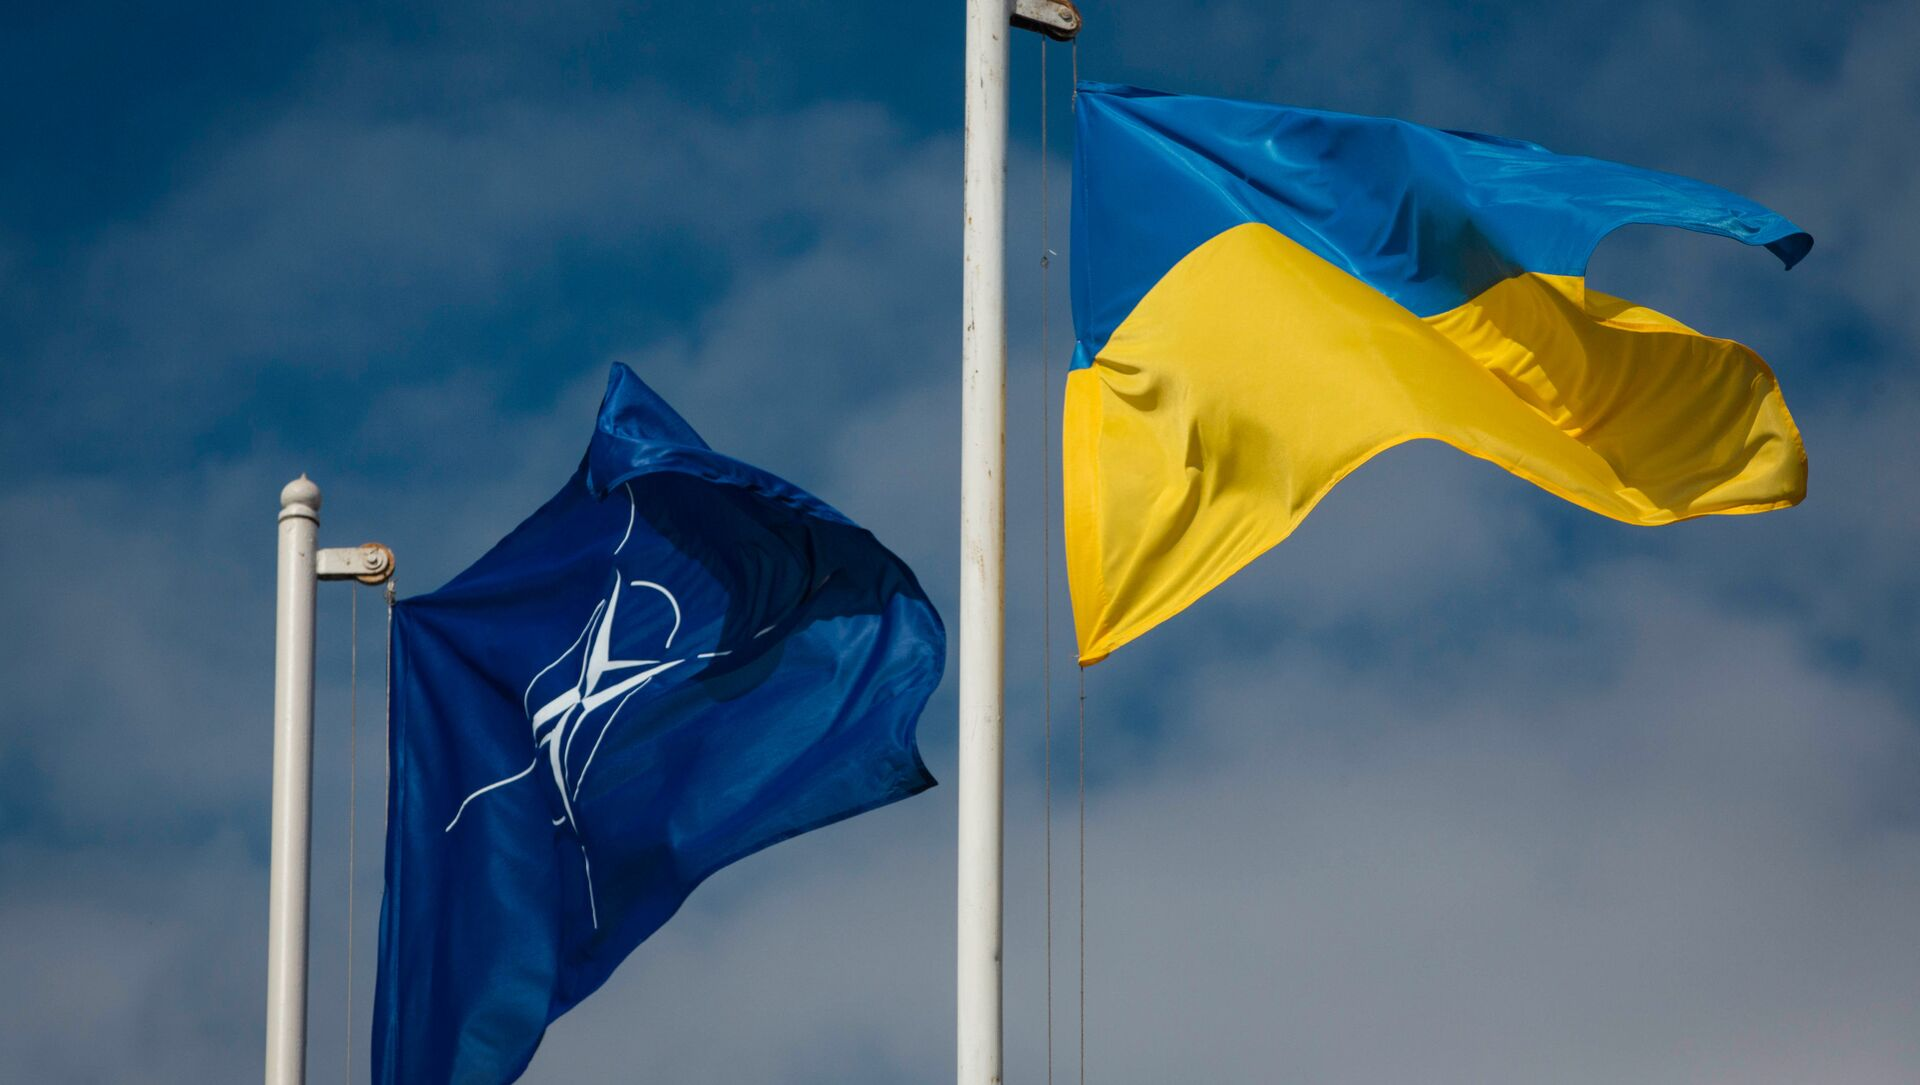 National flag of Ukraine and the NATO flag - Sputnik International, 1920, 14.06.2021